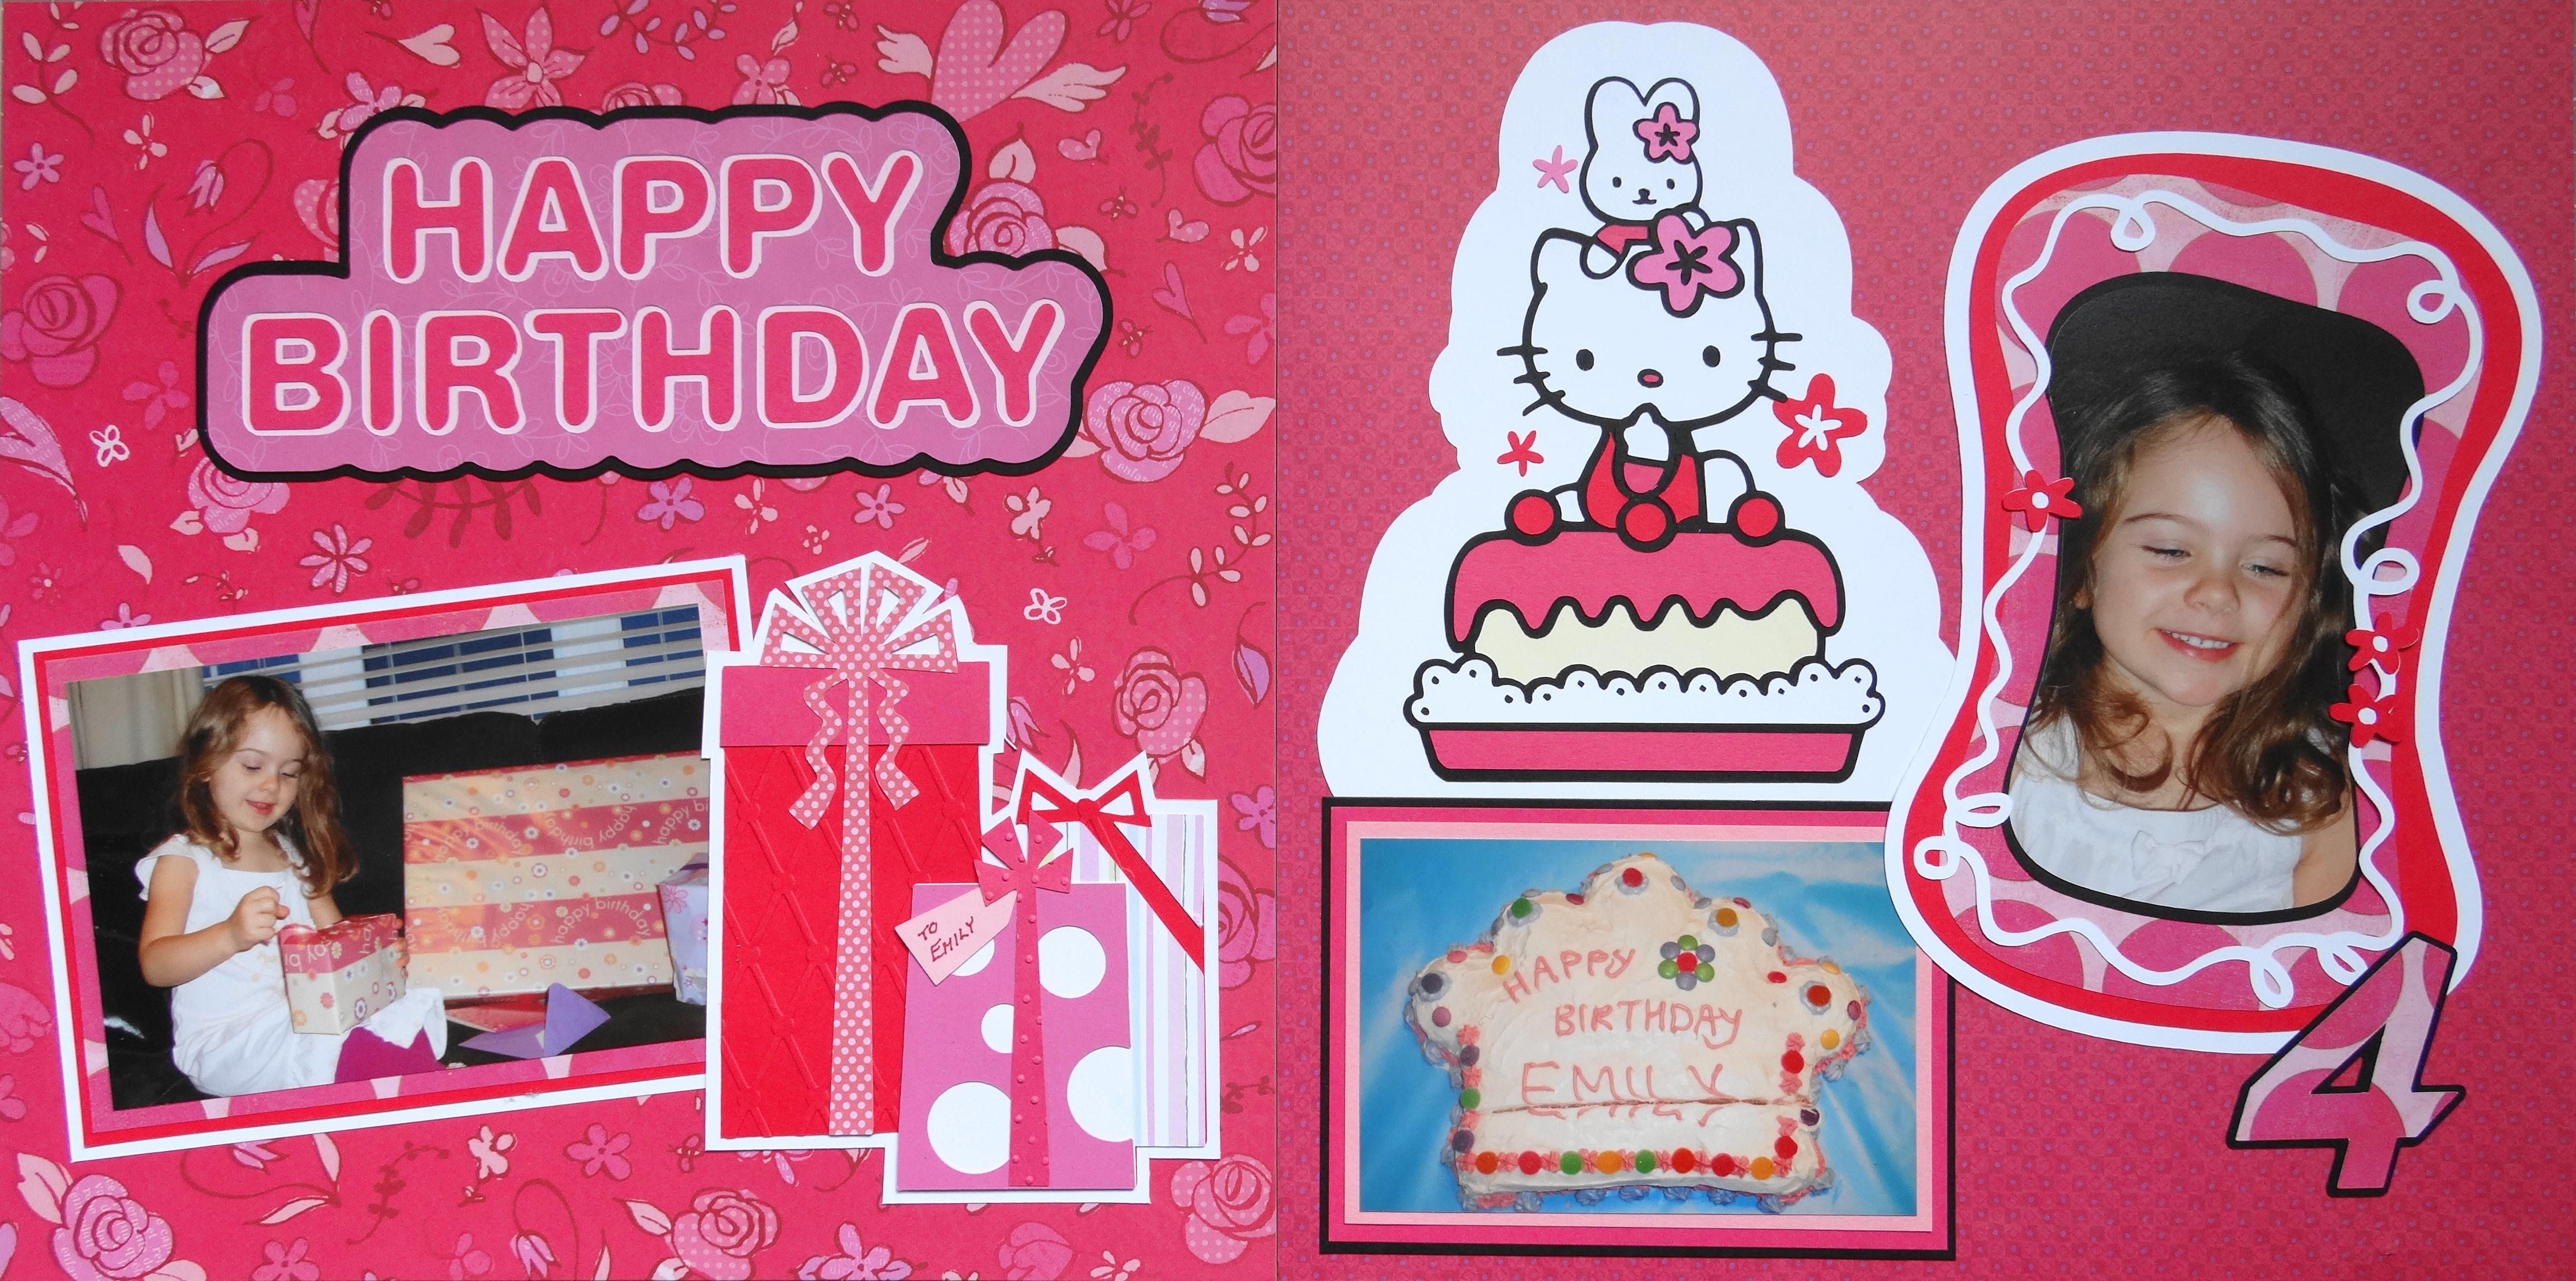 Hello kitty scrapbook ideas - Girl S Birthday Scrapbook Page Idea With Hello Kitty Theme Cake And Presents From Everyday Life Album